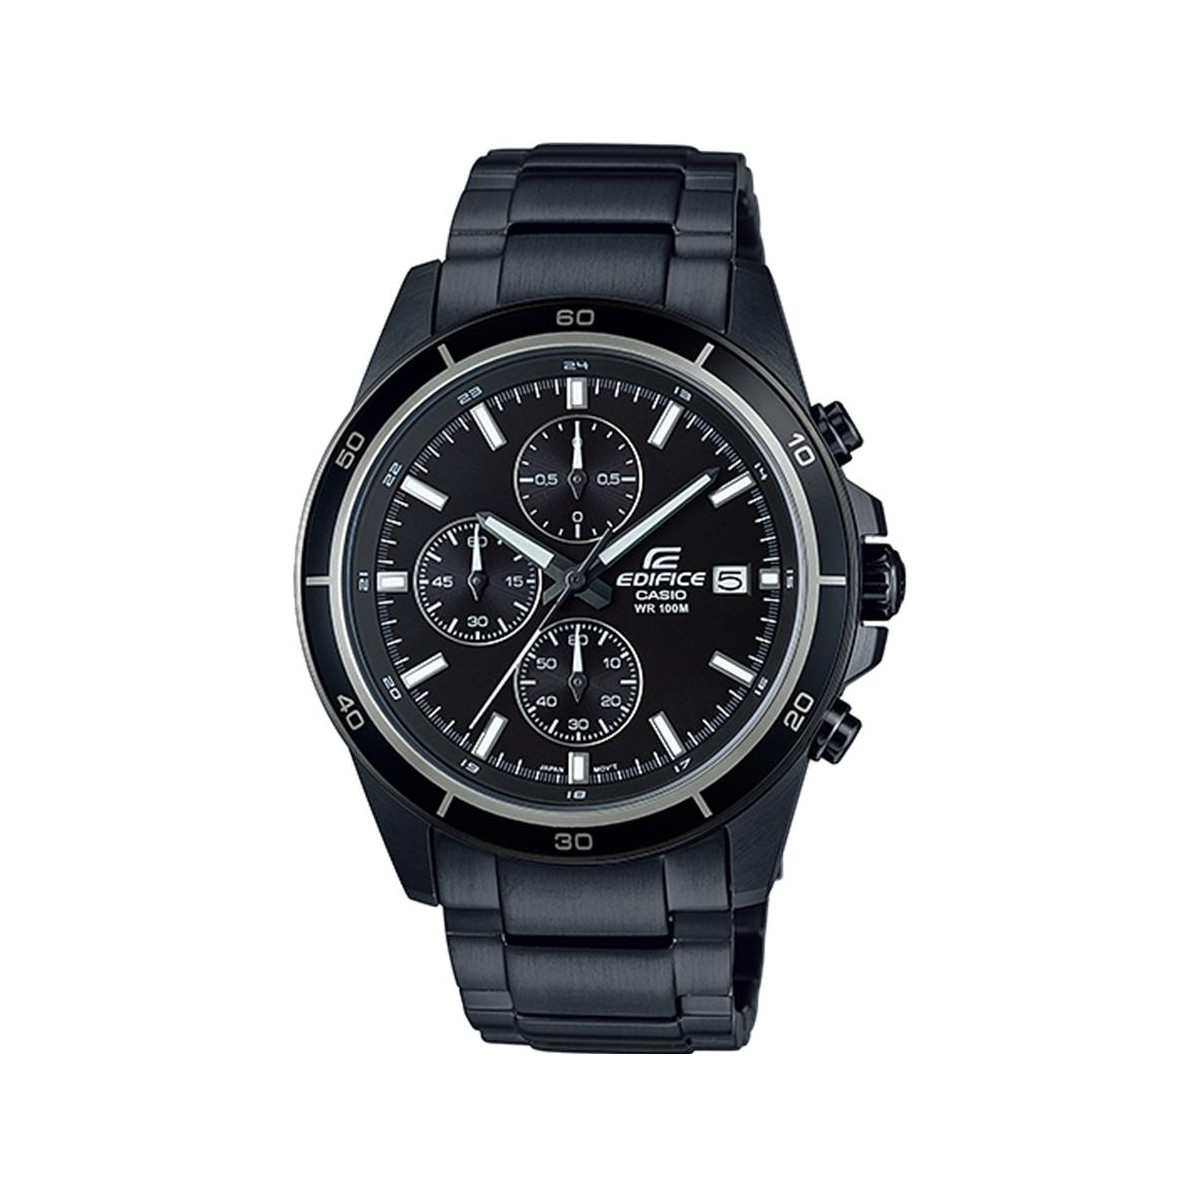 https://www.gaberjoyeria.com/4921-thickbox_default/reloj-casio-edifice.jpg